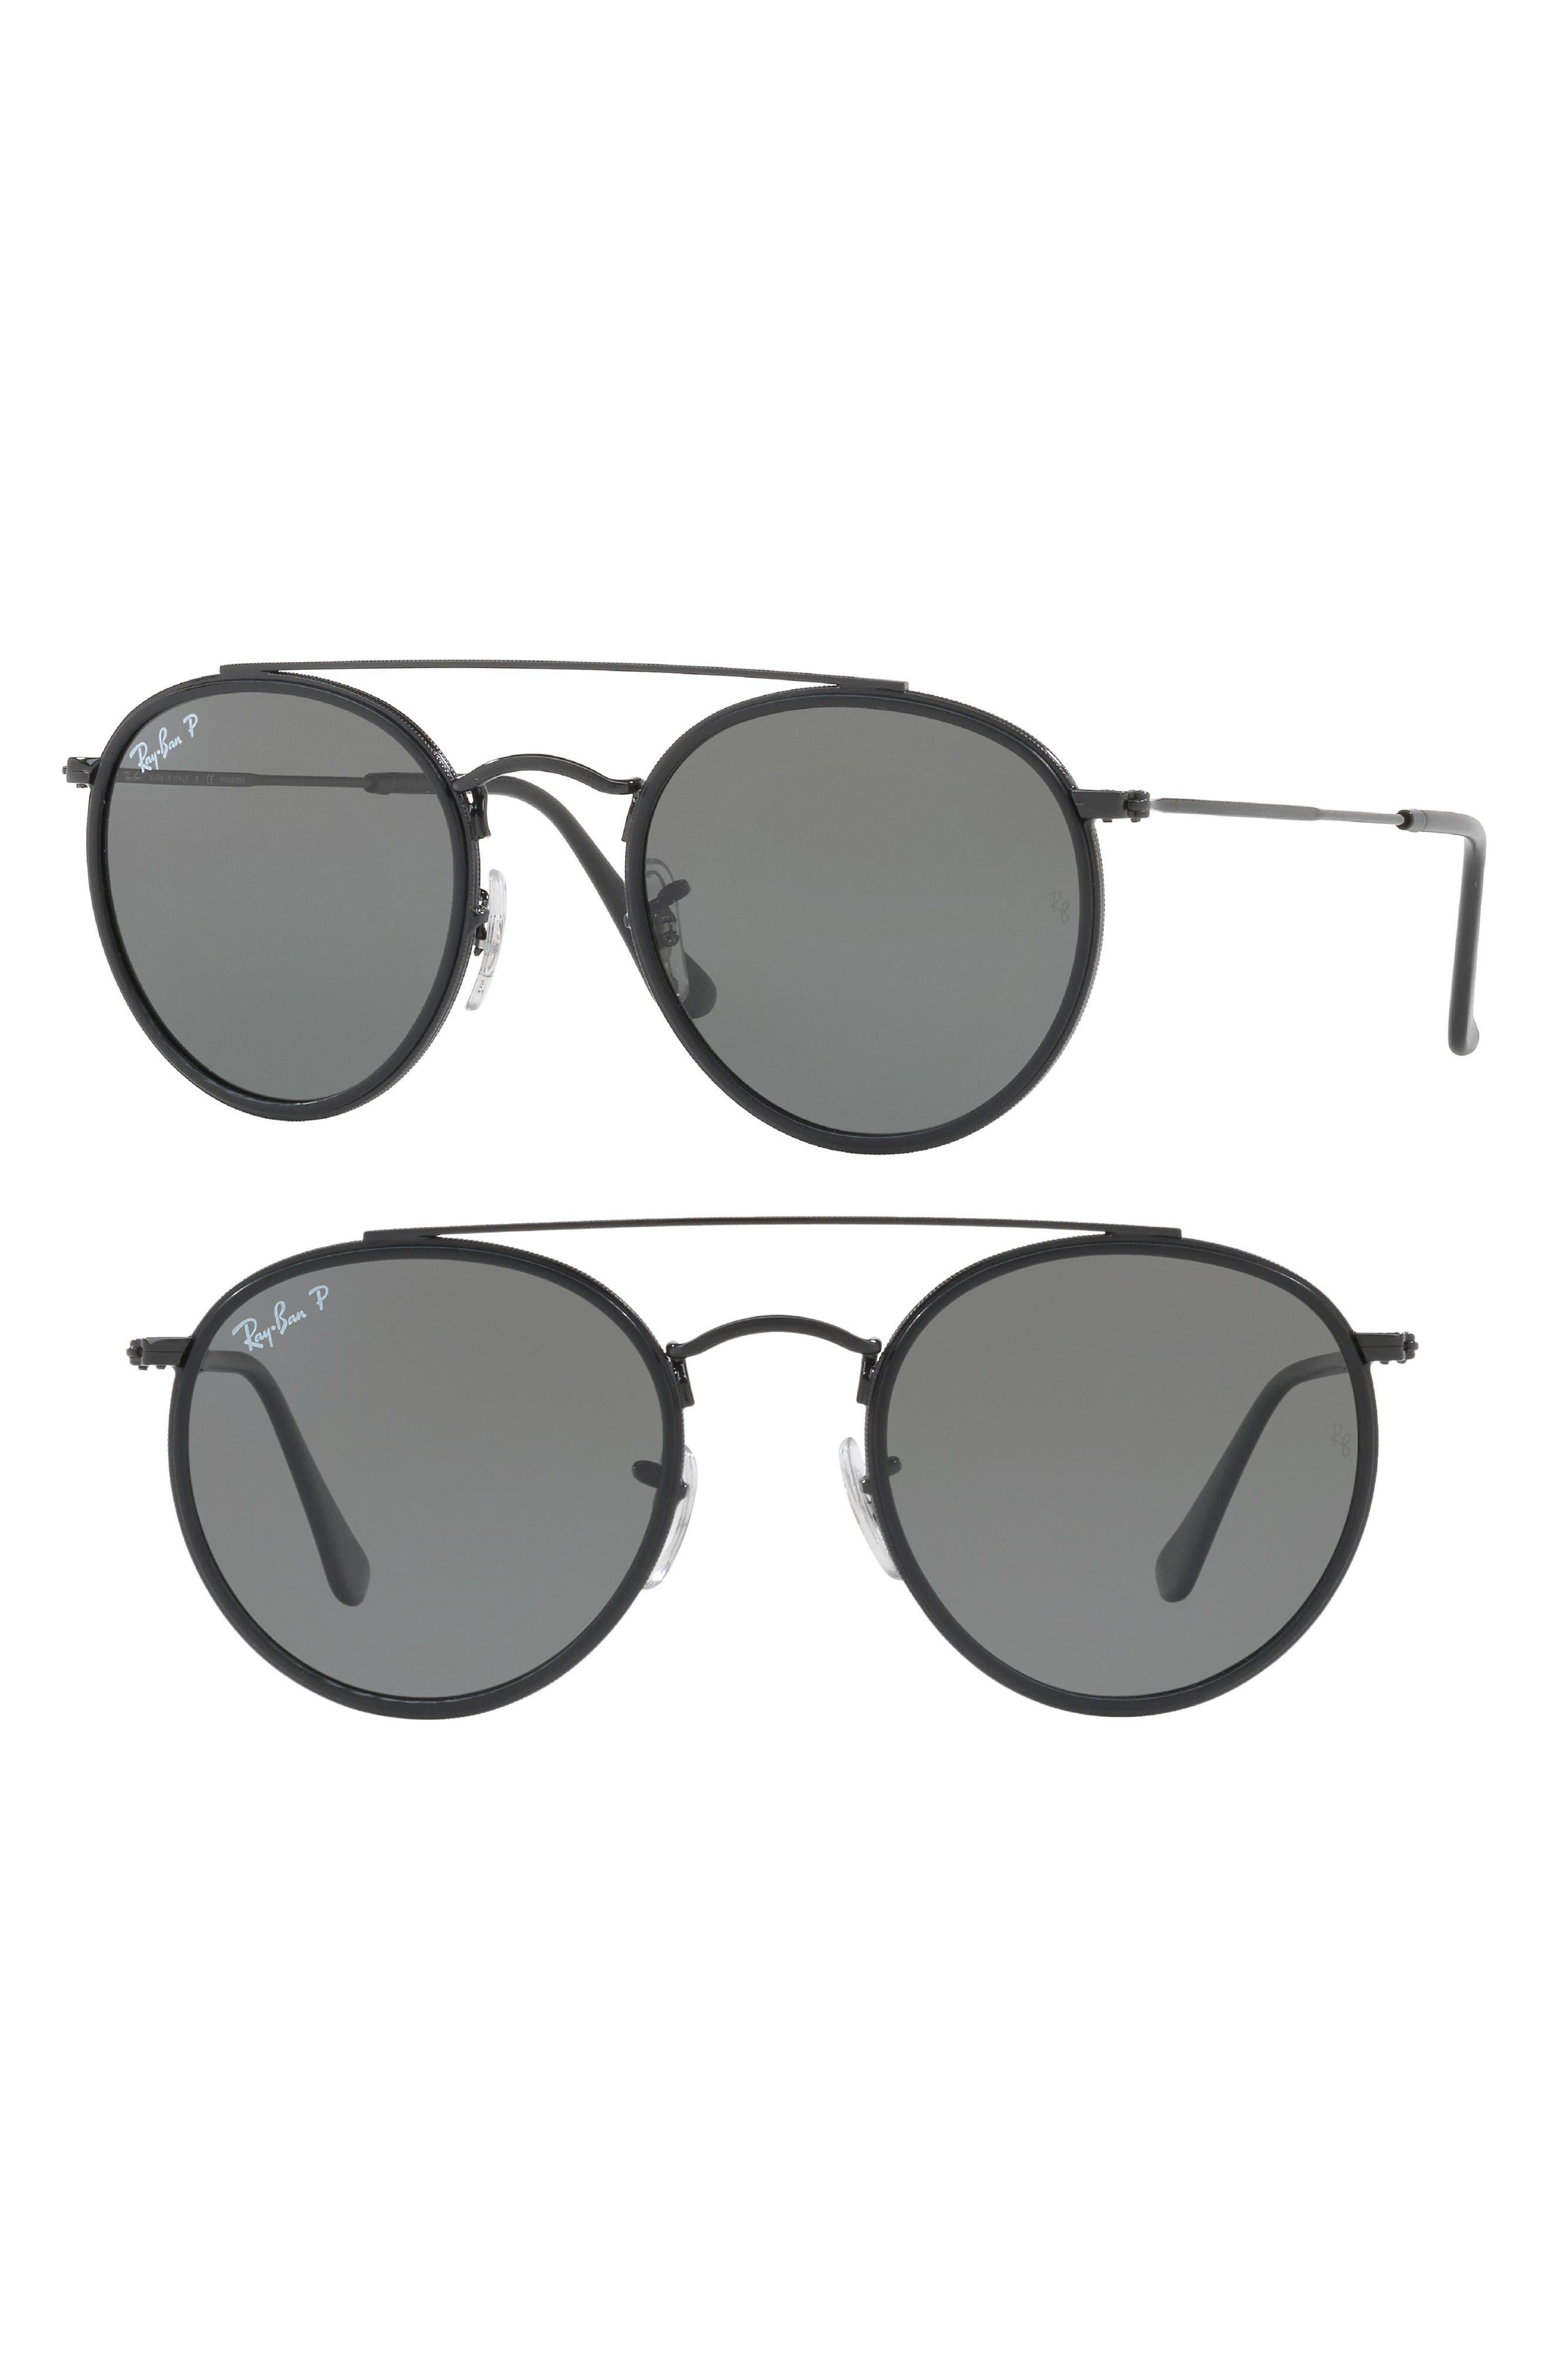 51mm Polarized Round Sunglasses,                         Main,                         color, 001